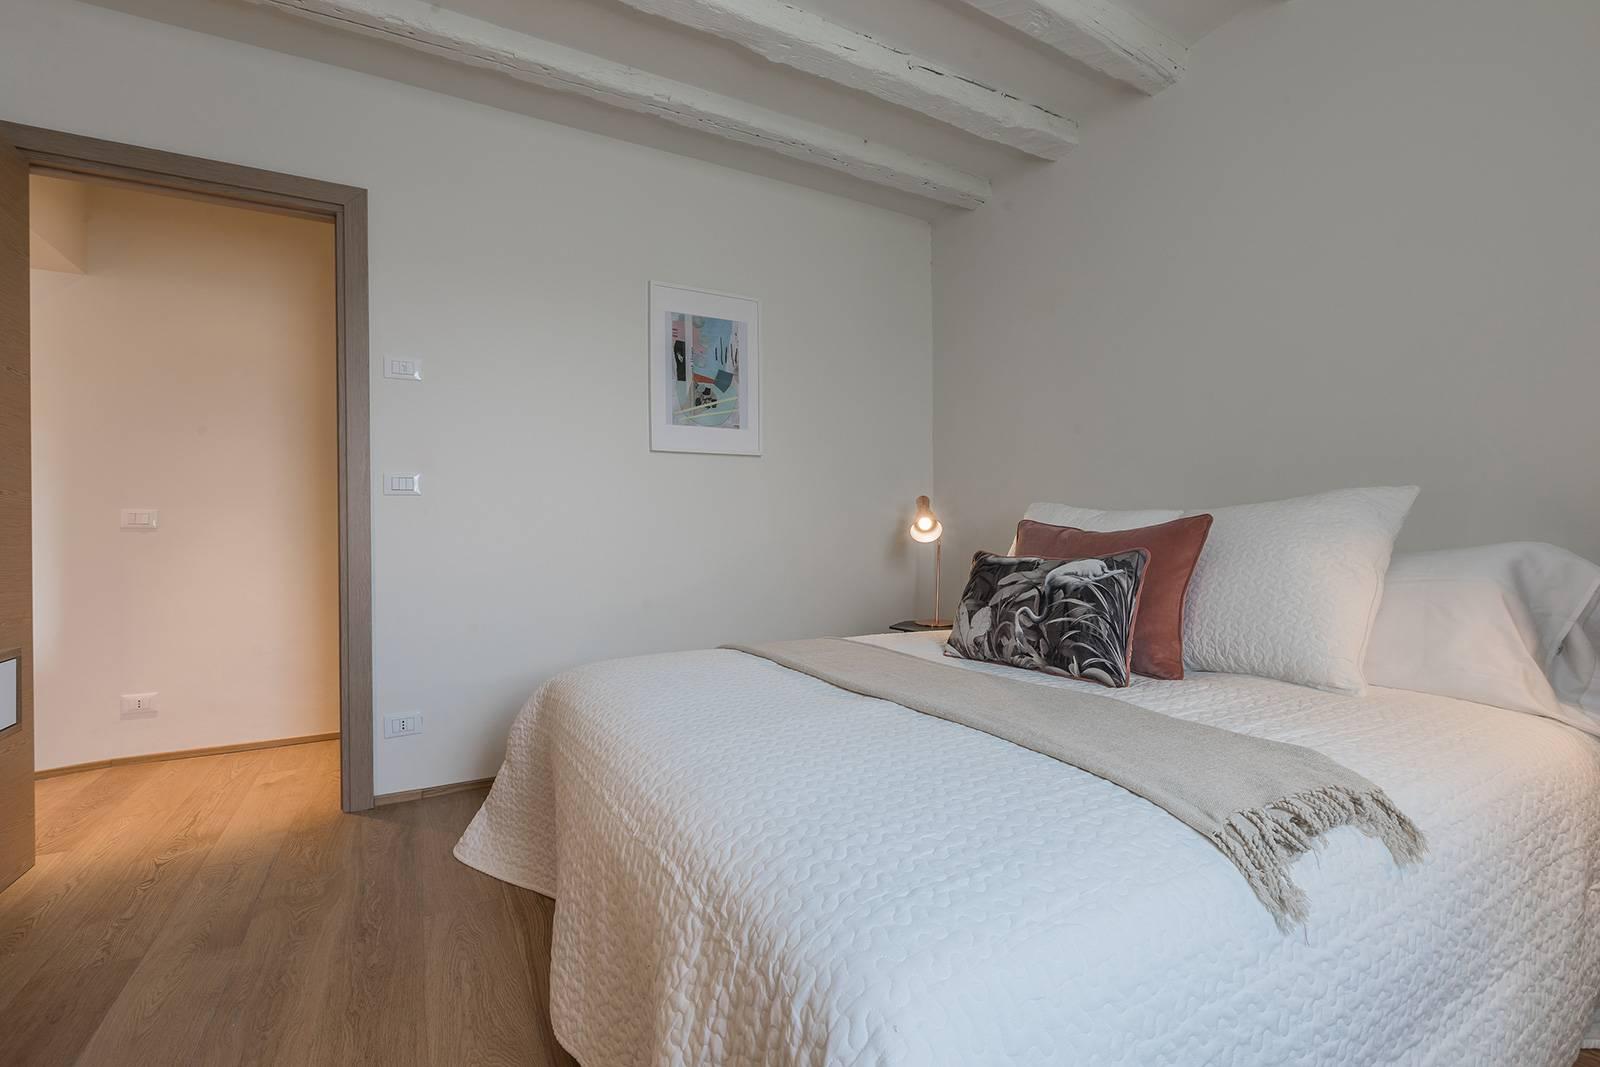 opposite view of the bedroom